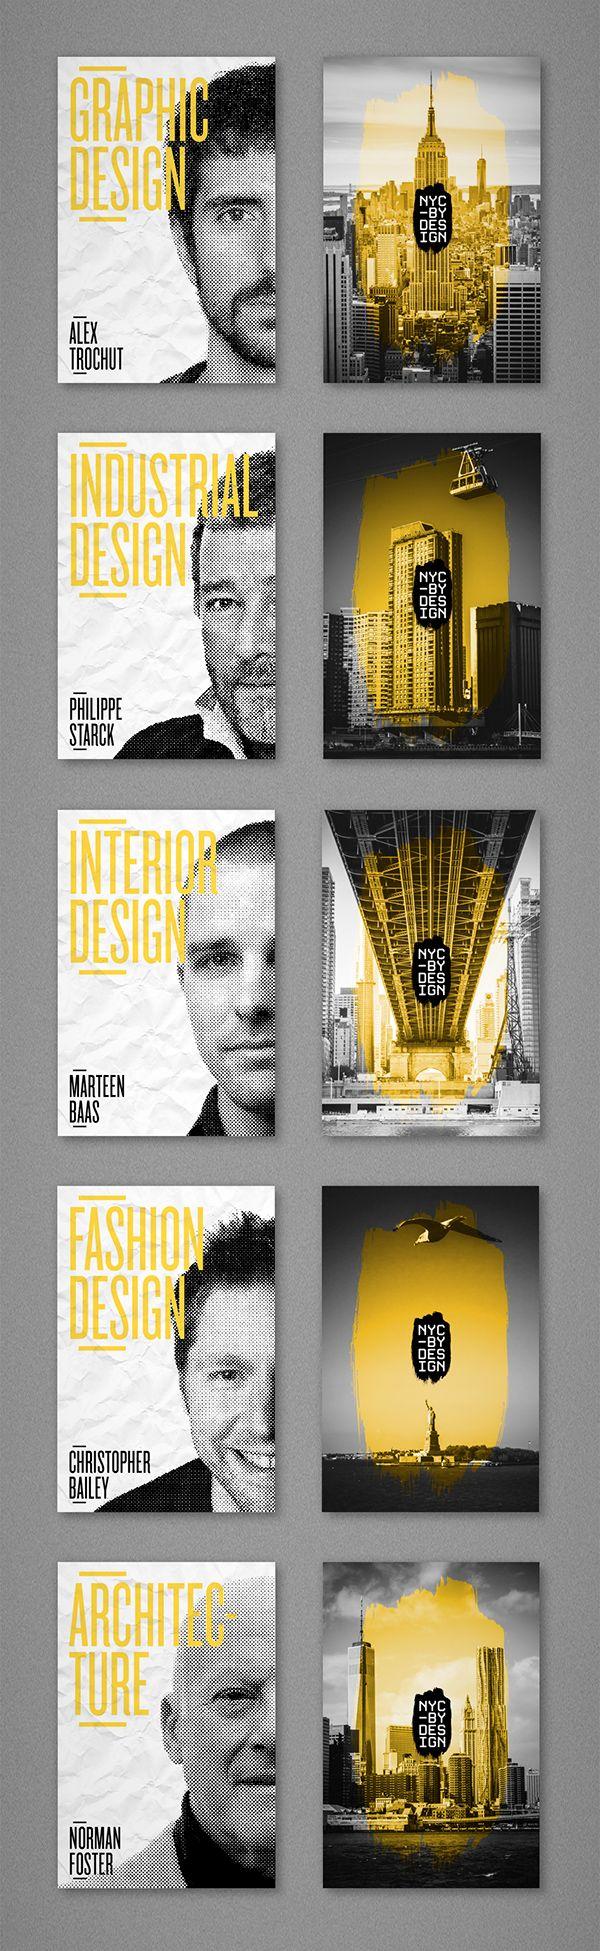 NYCxDesign - New York Design Week on Behance